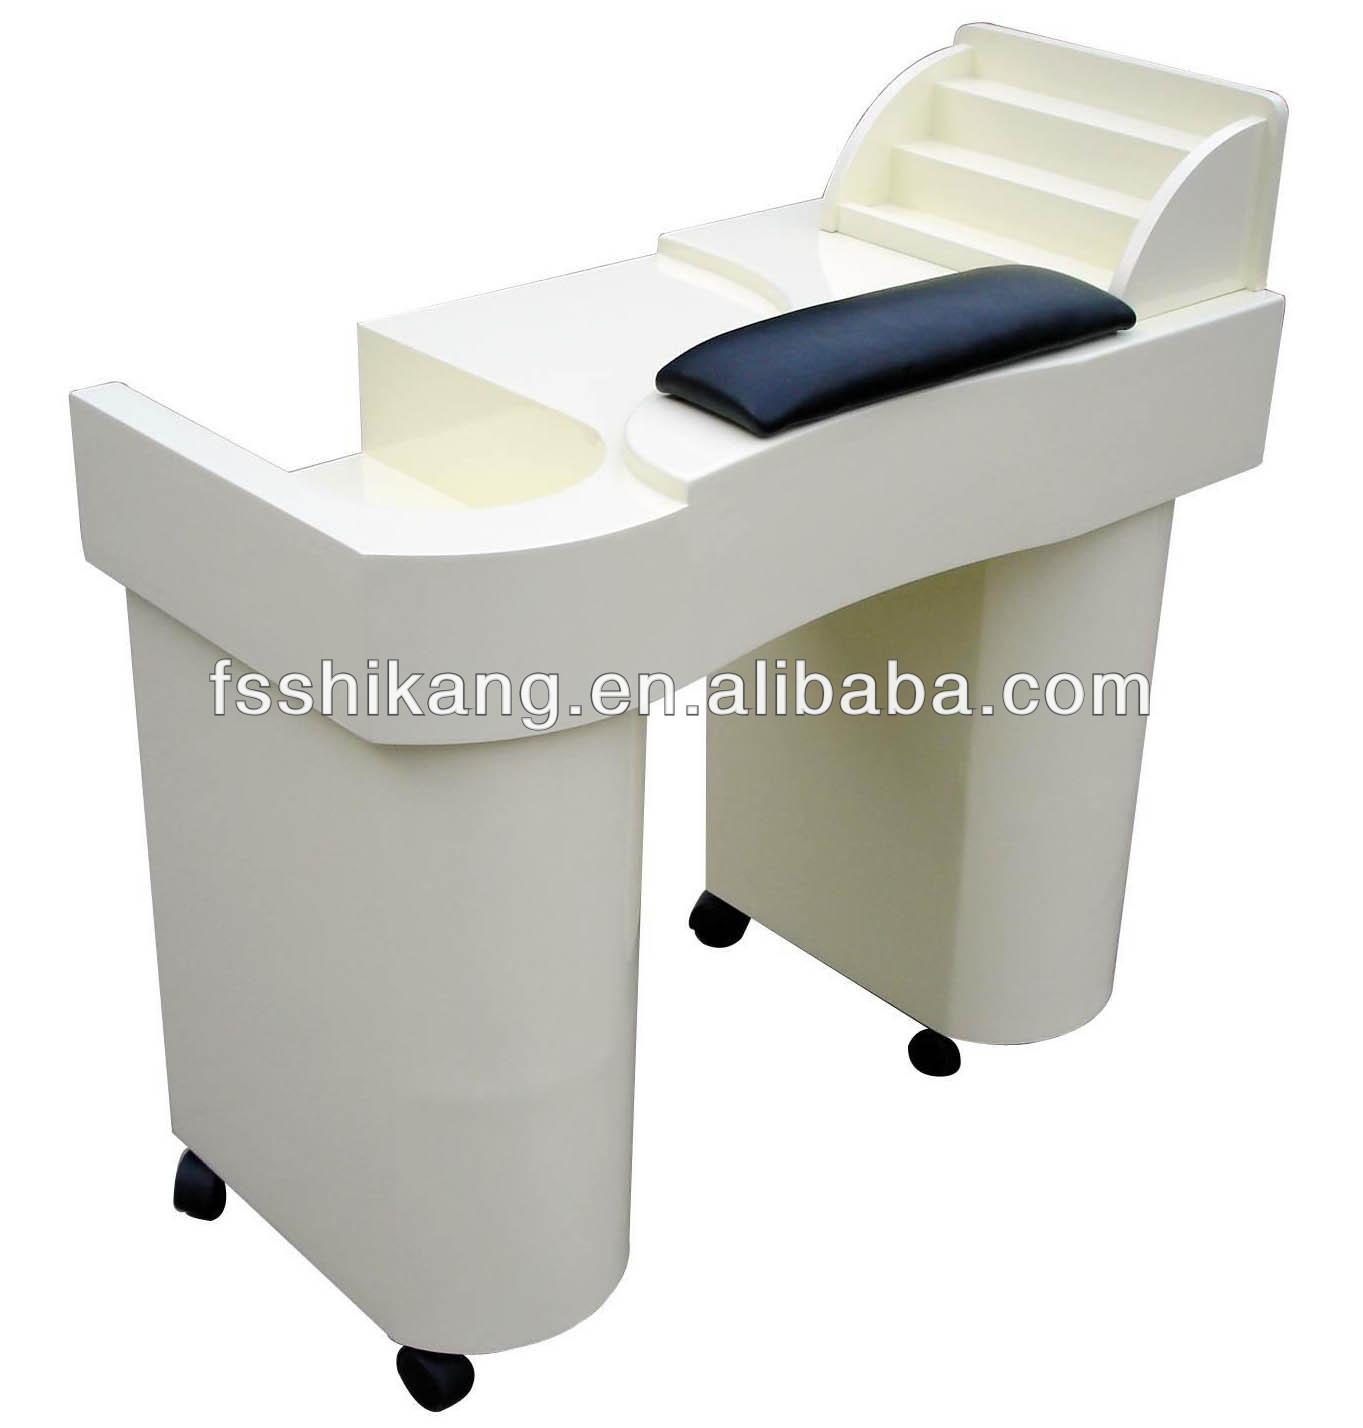 modern design salon furniture white nail tables for sale buy nail tables for sale nail salon. Black Bedroom Furniture Sets. Home Design Ideas